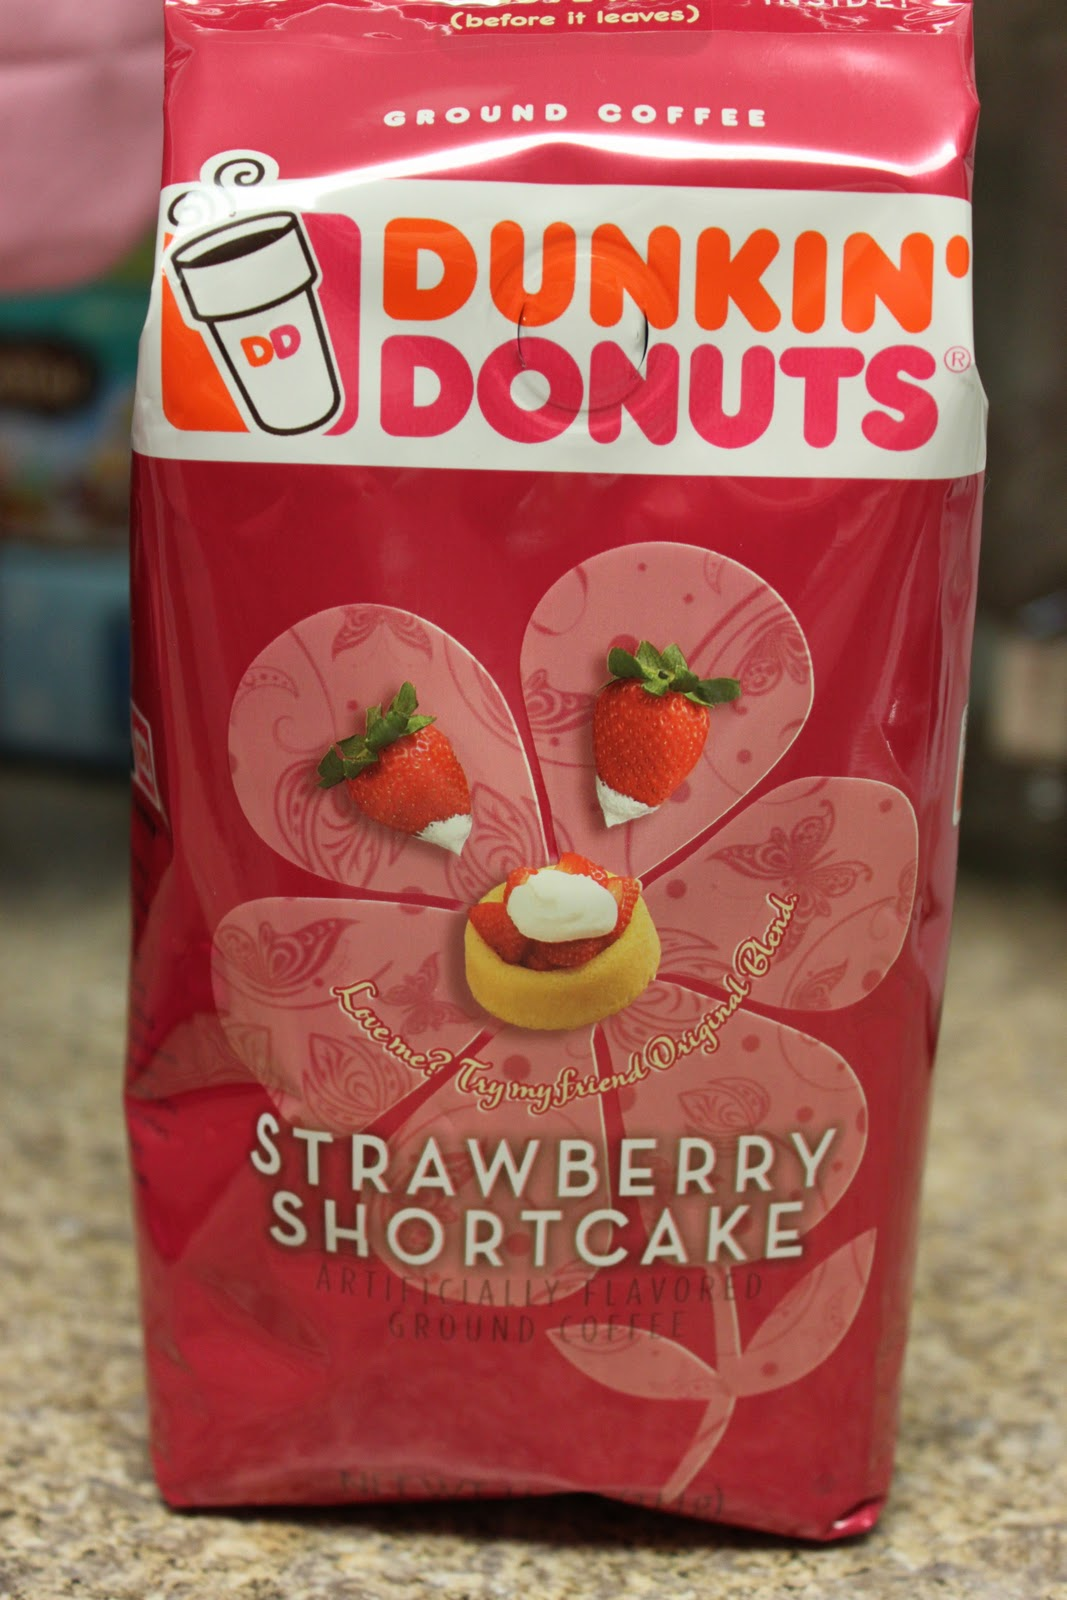 Strawberry Shortcake coffee